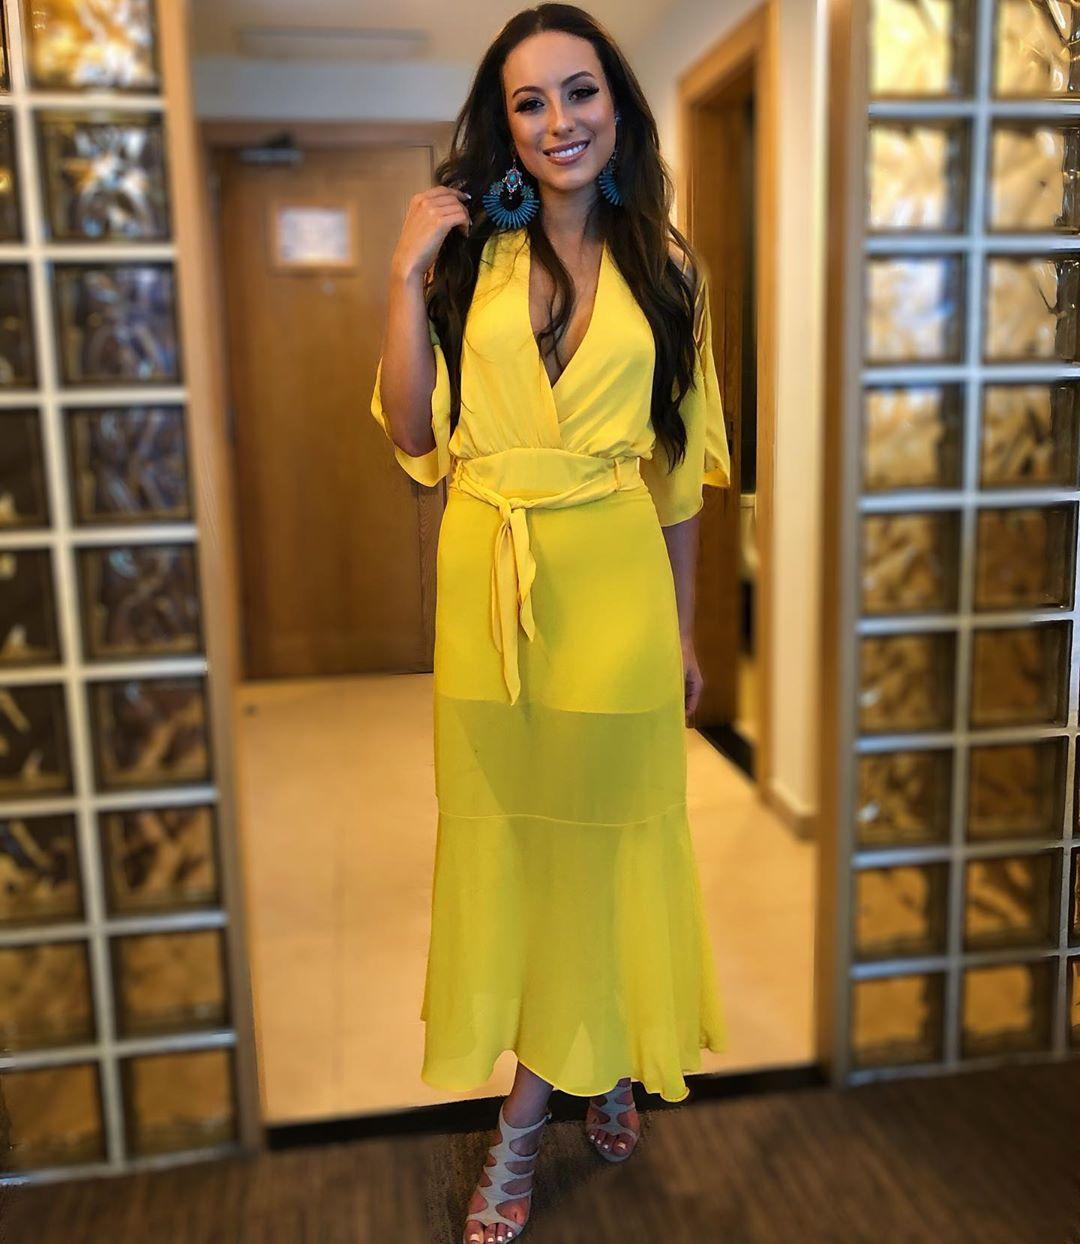 cristine boff sartor, segunda finalista de miss latinoamerica 2019. - Página 7 68829610